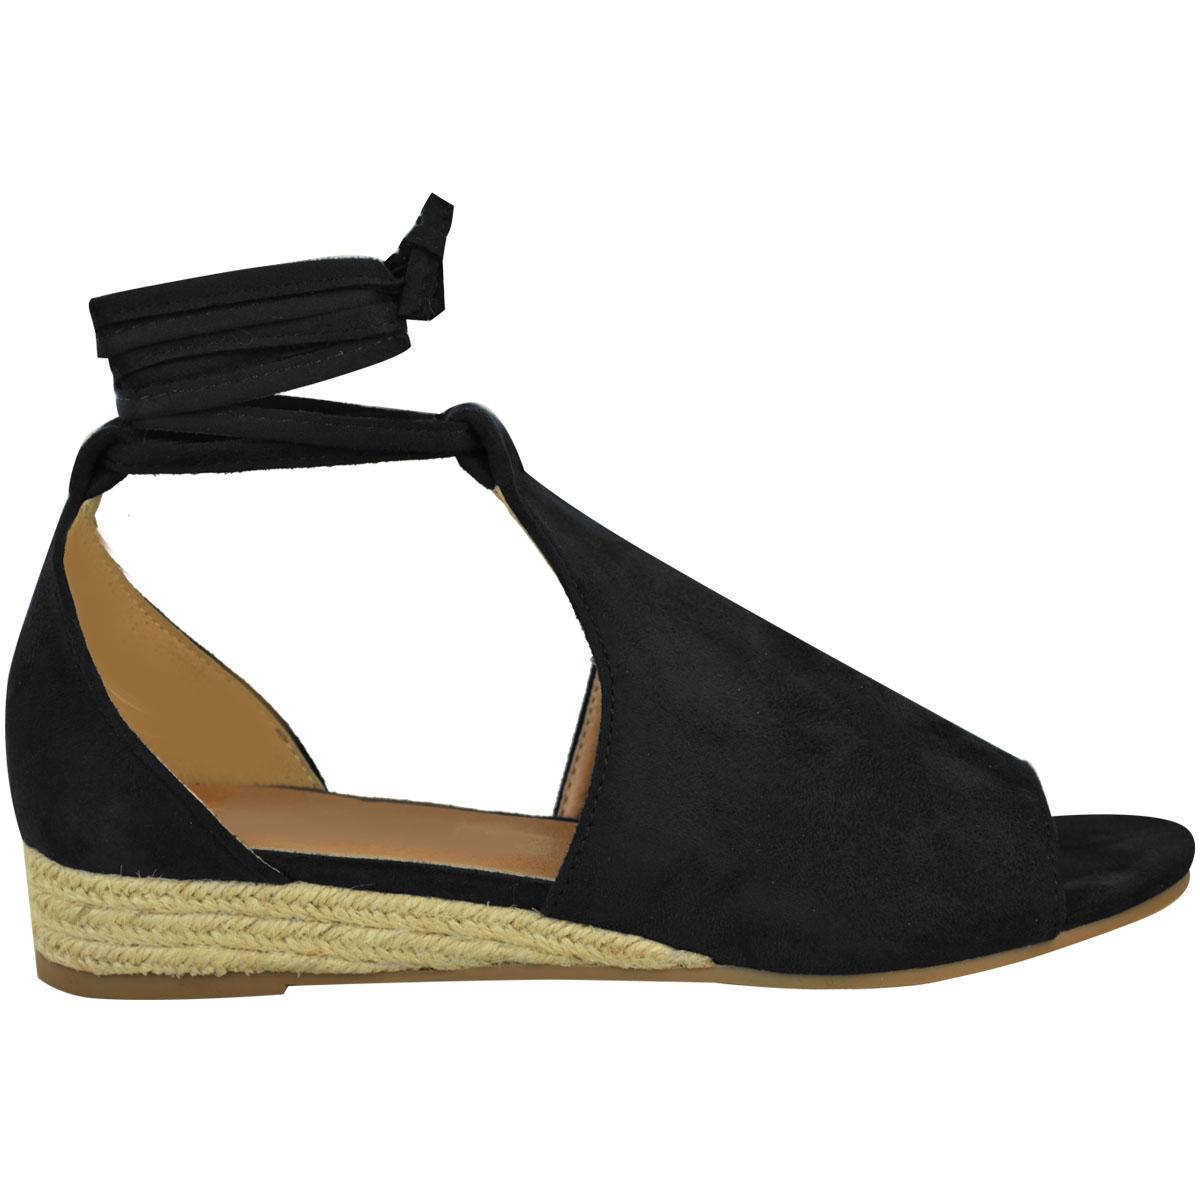 Ladies Womens Wedges Espadrilles Lace Tie Up Low Heel Comfy Sandals Shoes Size